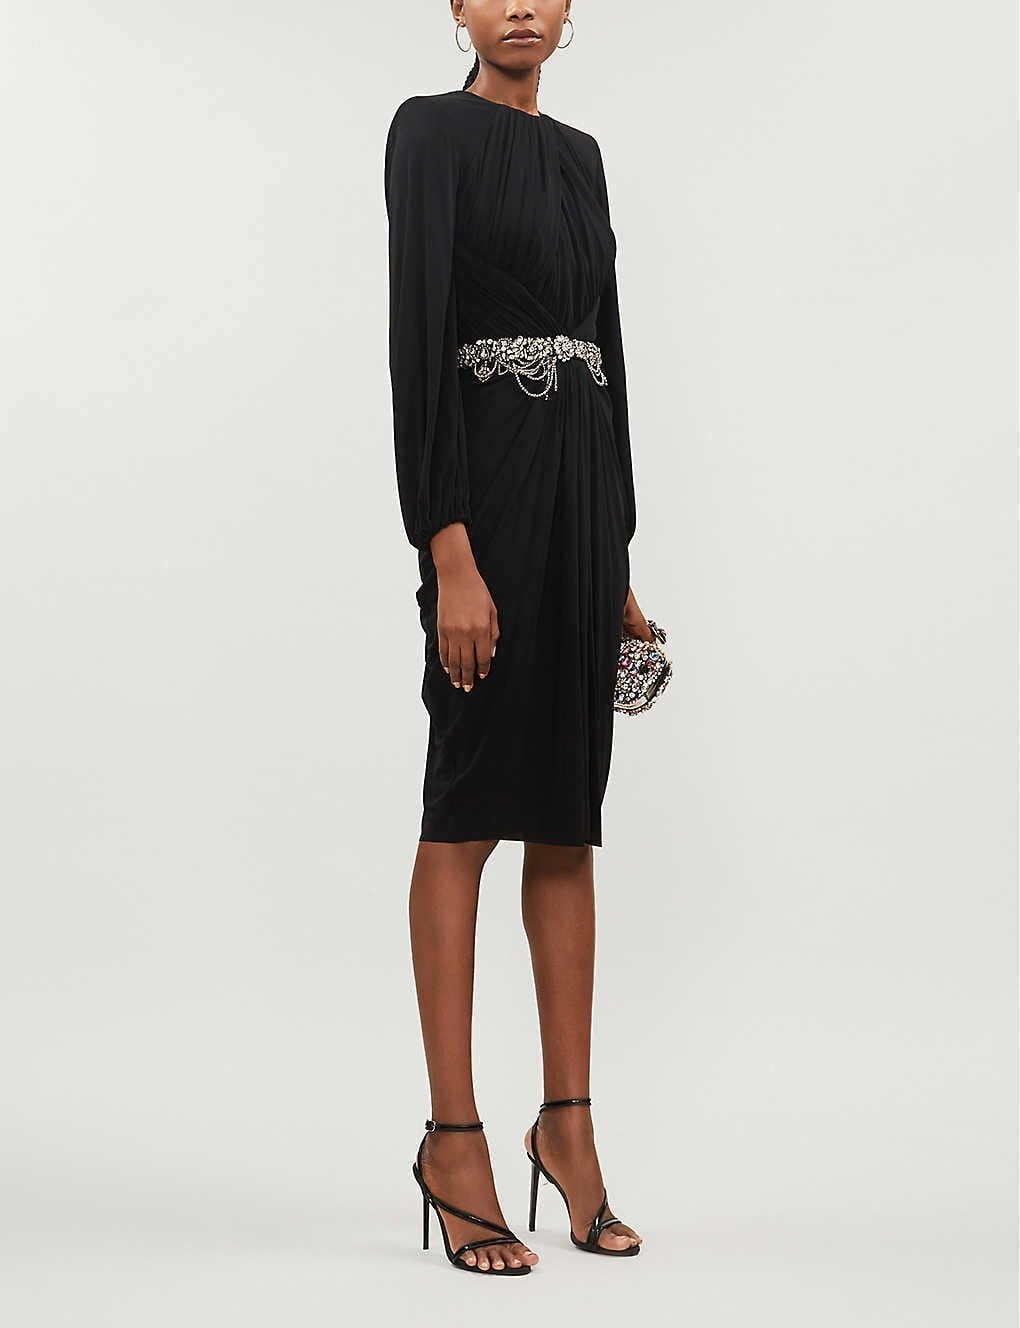 ALEXANDER MCQUEEN Draped Crystal-embellished Crepe Midi Dress